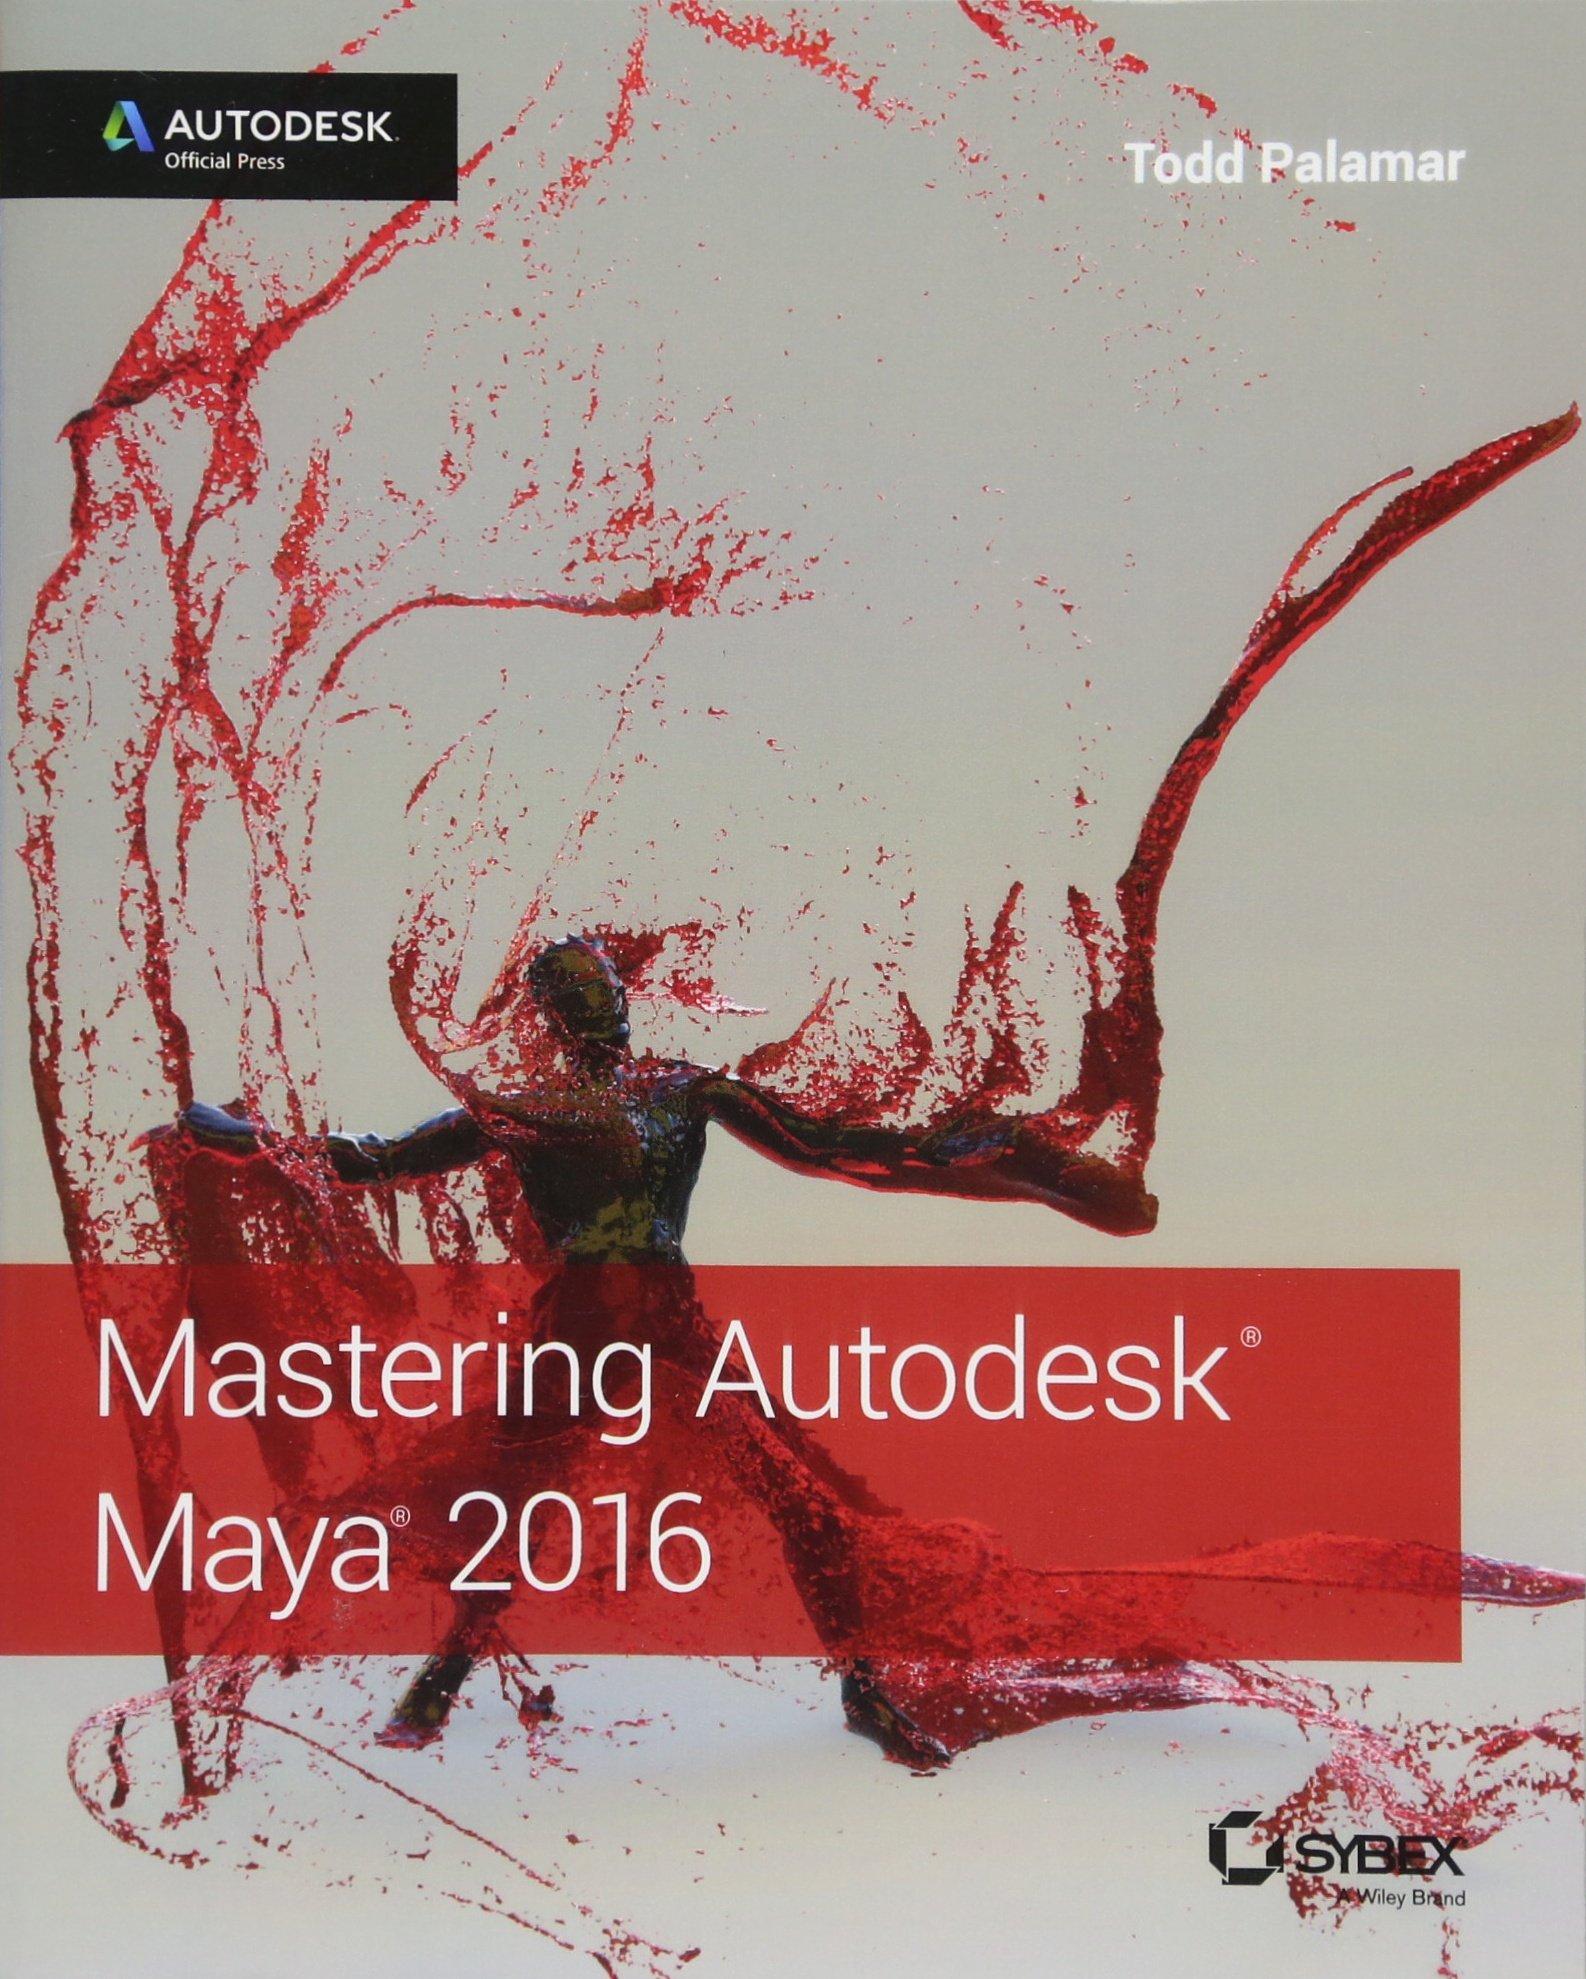 Mastering Autodesk Maya 2016: Autodesk Official Press: Todd